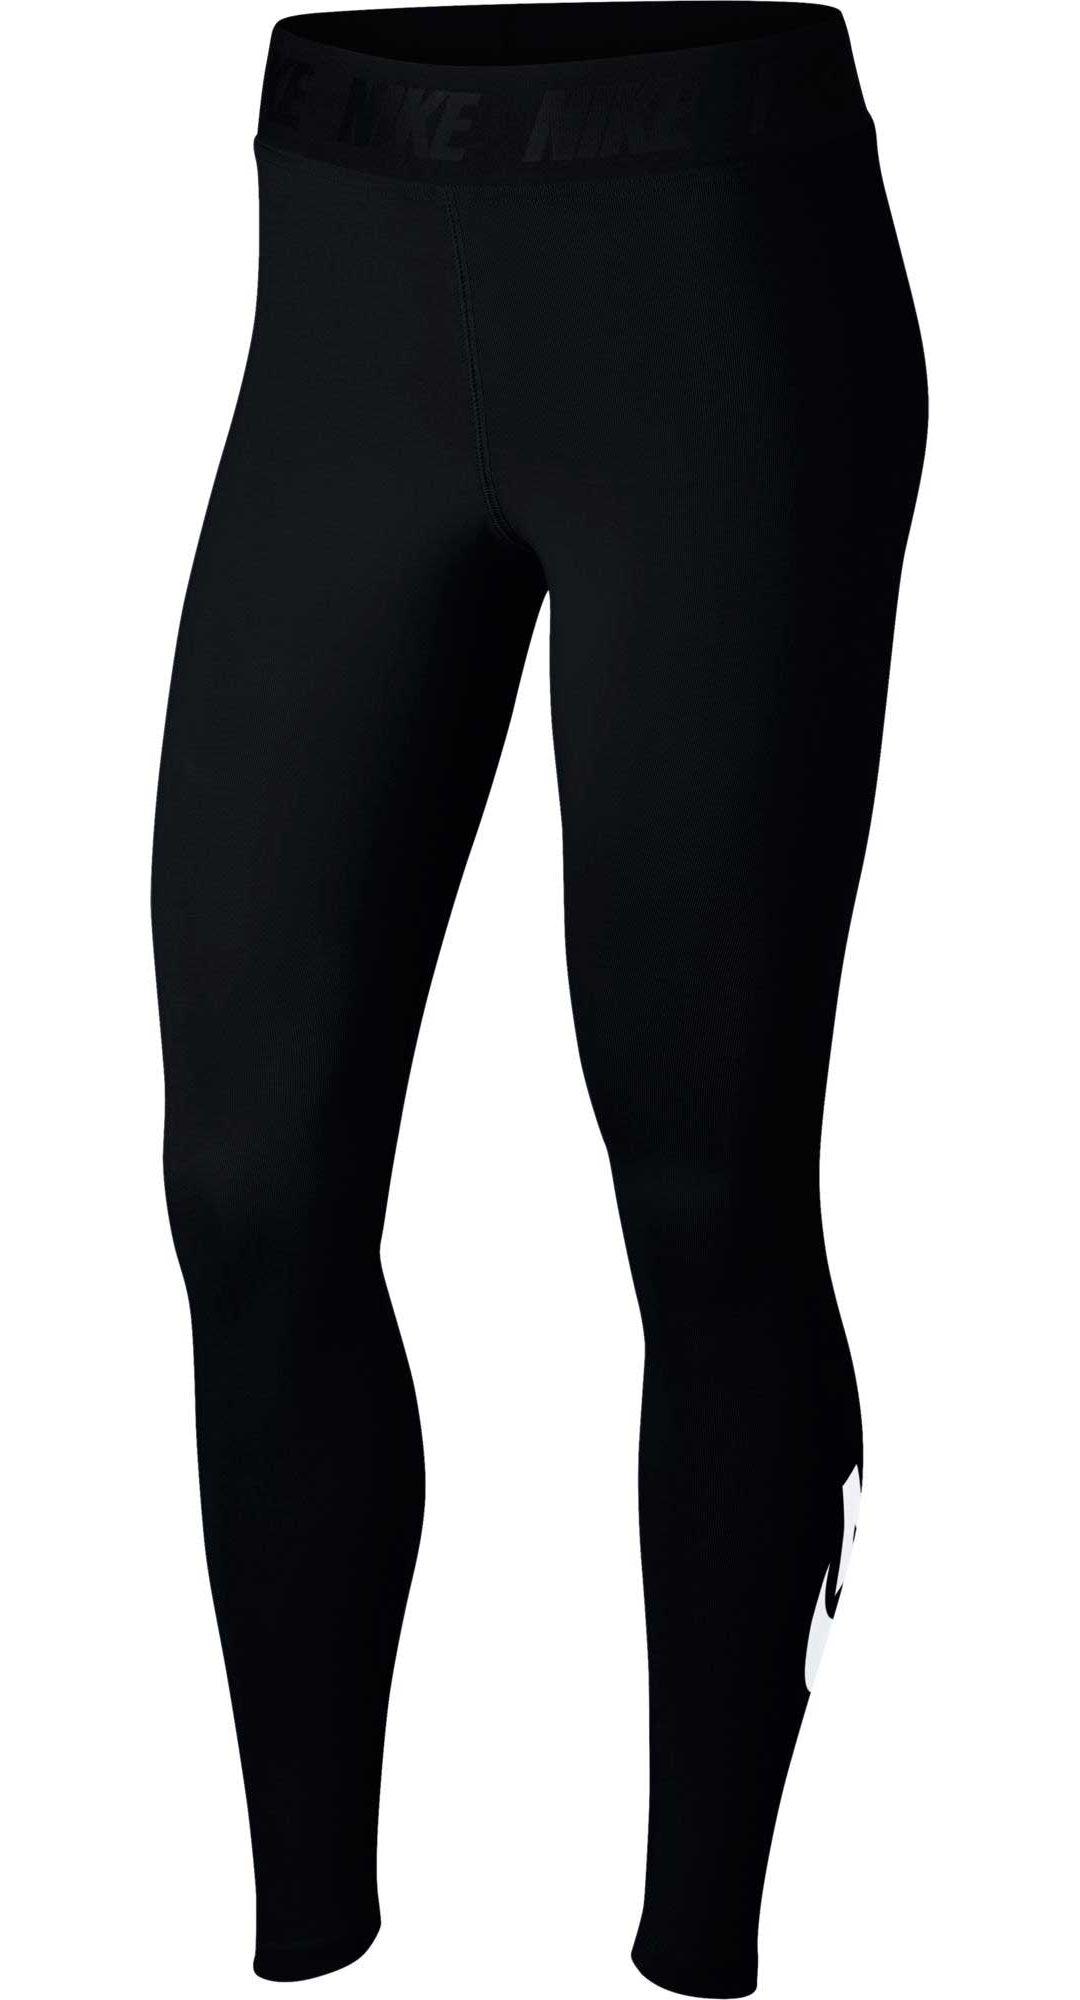 30a94358 Nike Women's Sportswear High Waisted Leg-A-See Graphic Tights